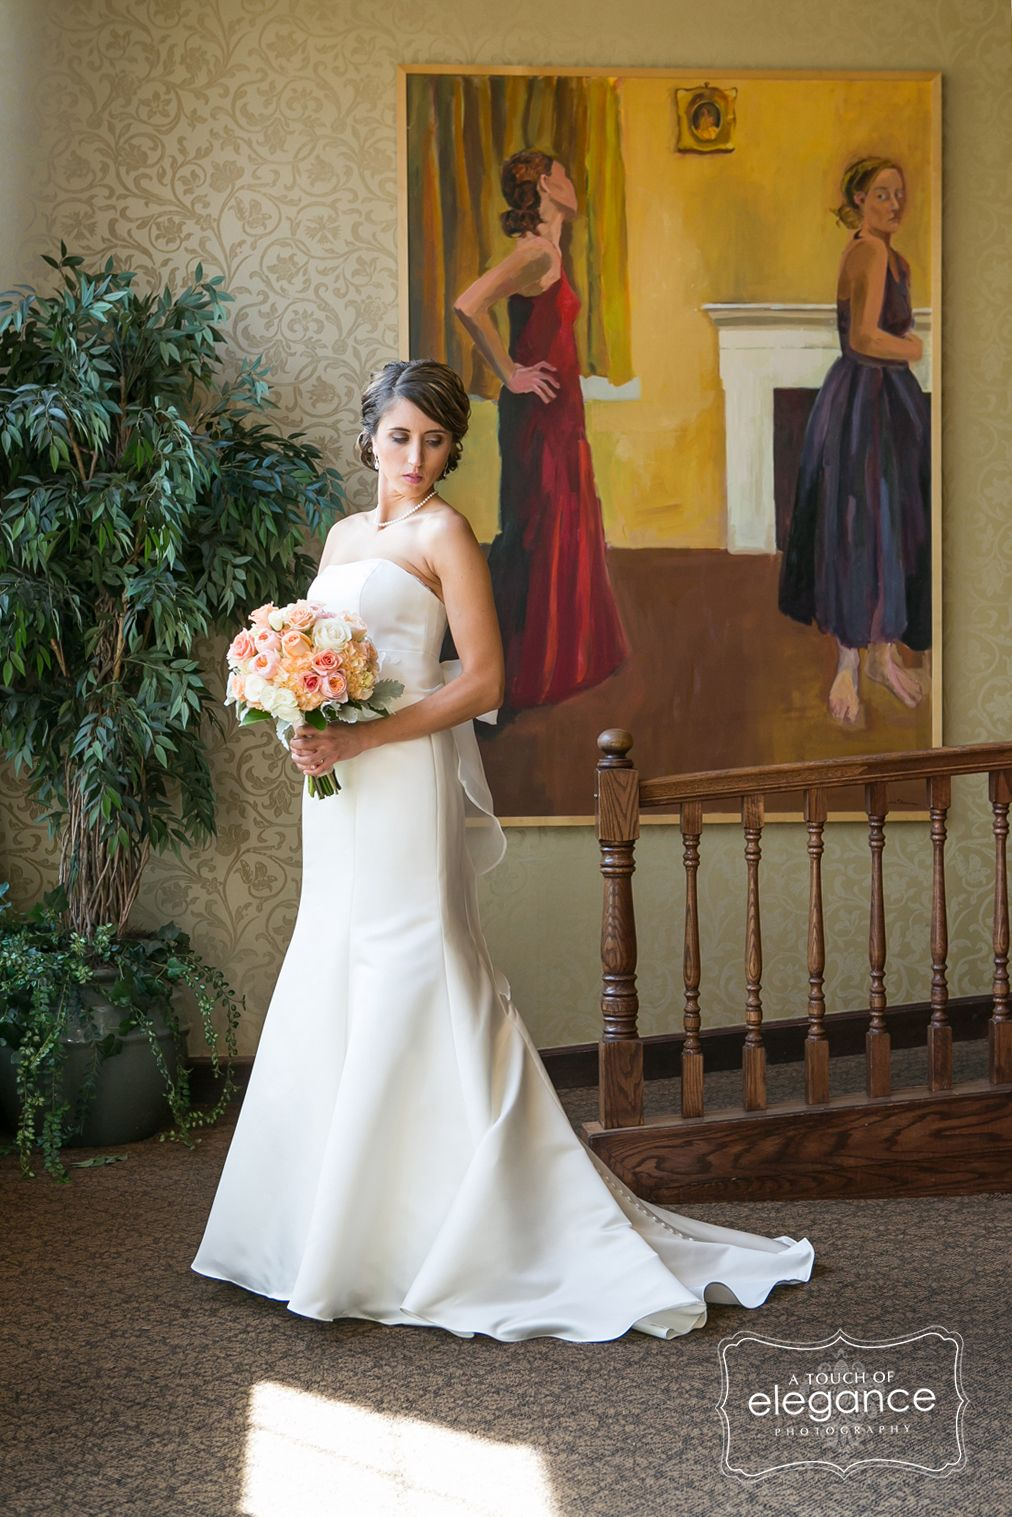 The Beautiful Bride Beautiful Bride Wedding Dresses Bridesmaid Dresses